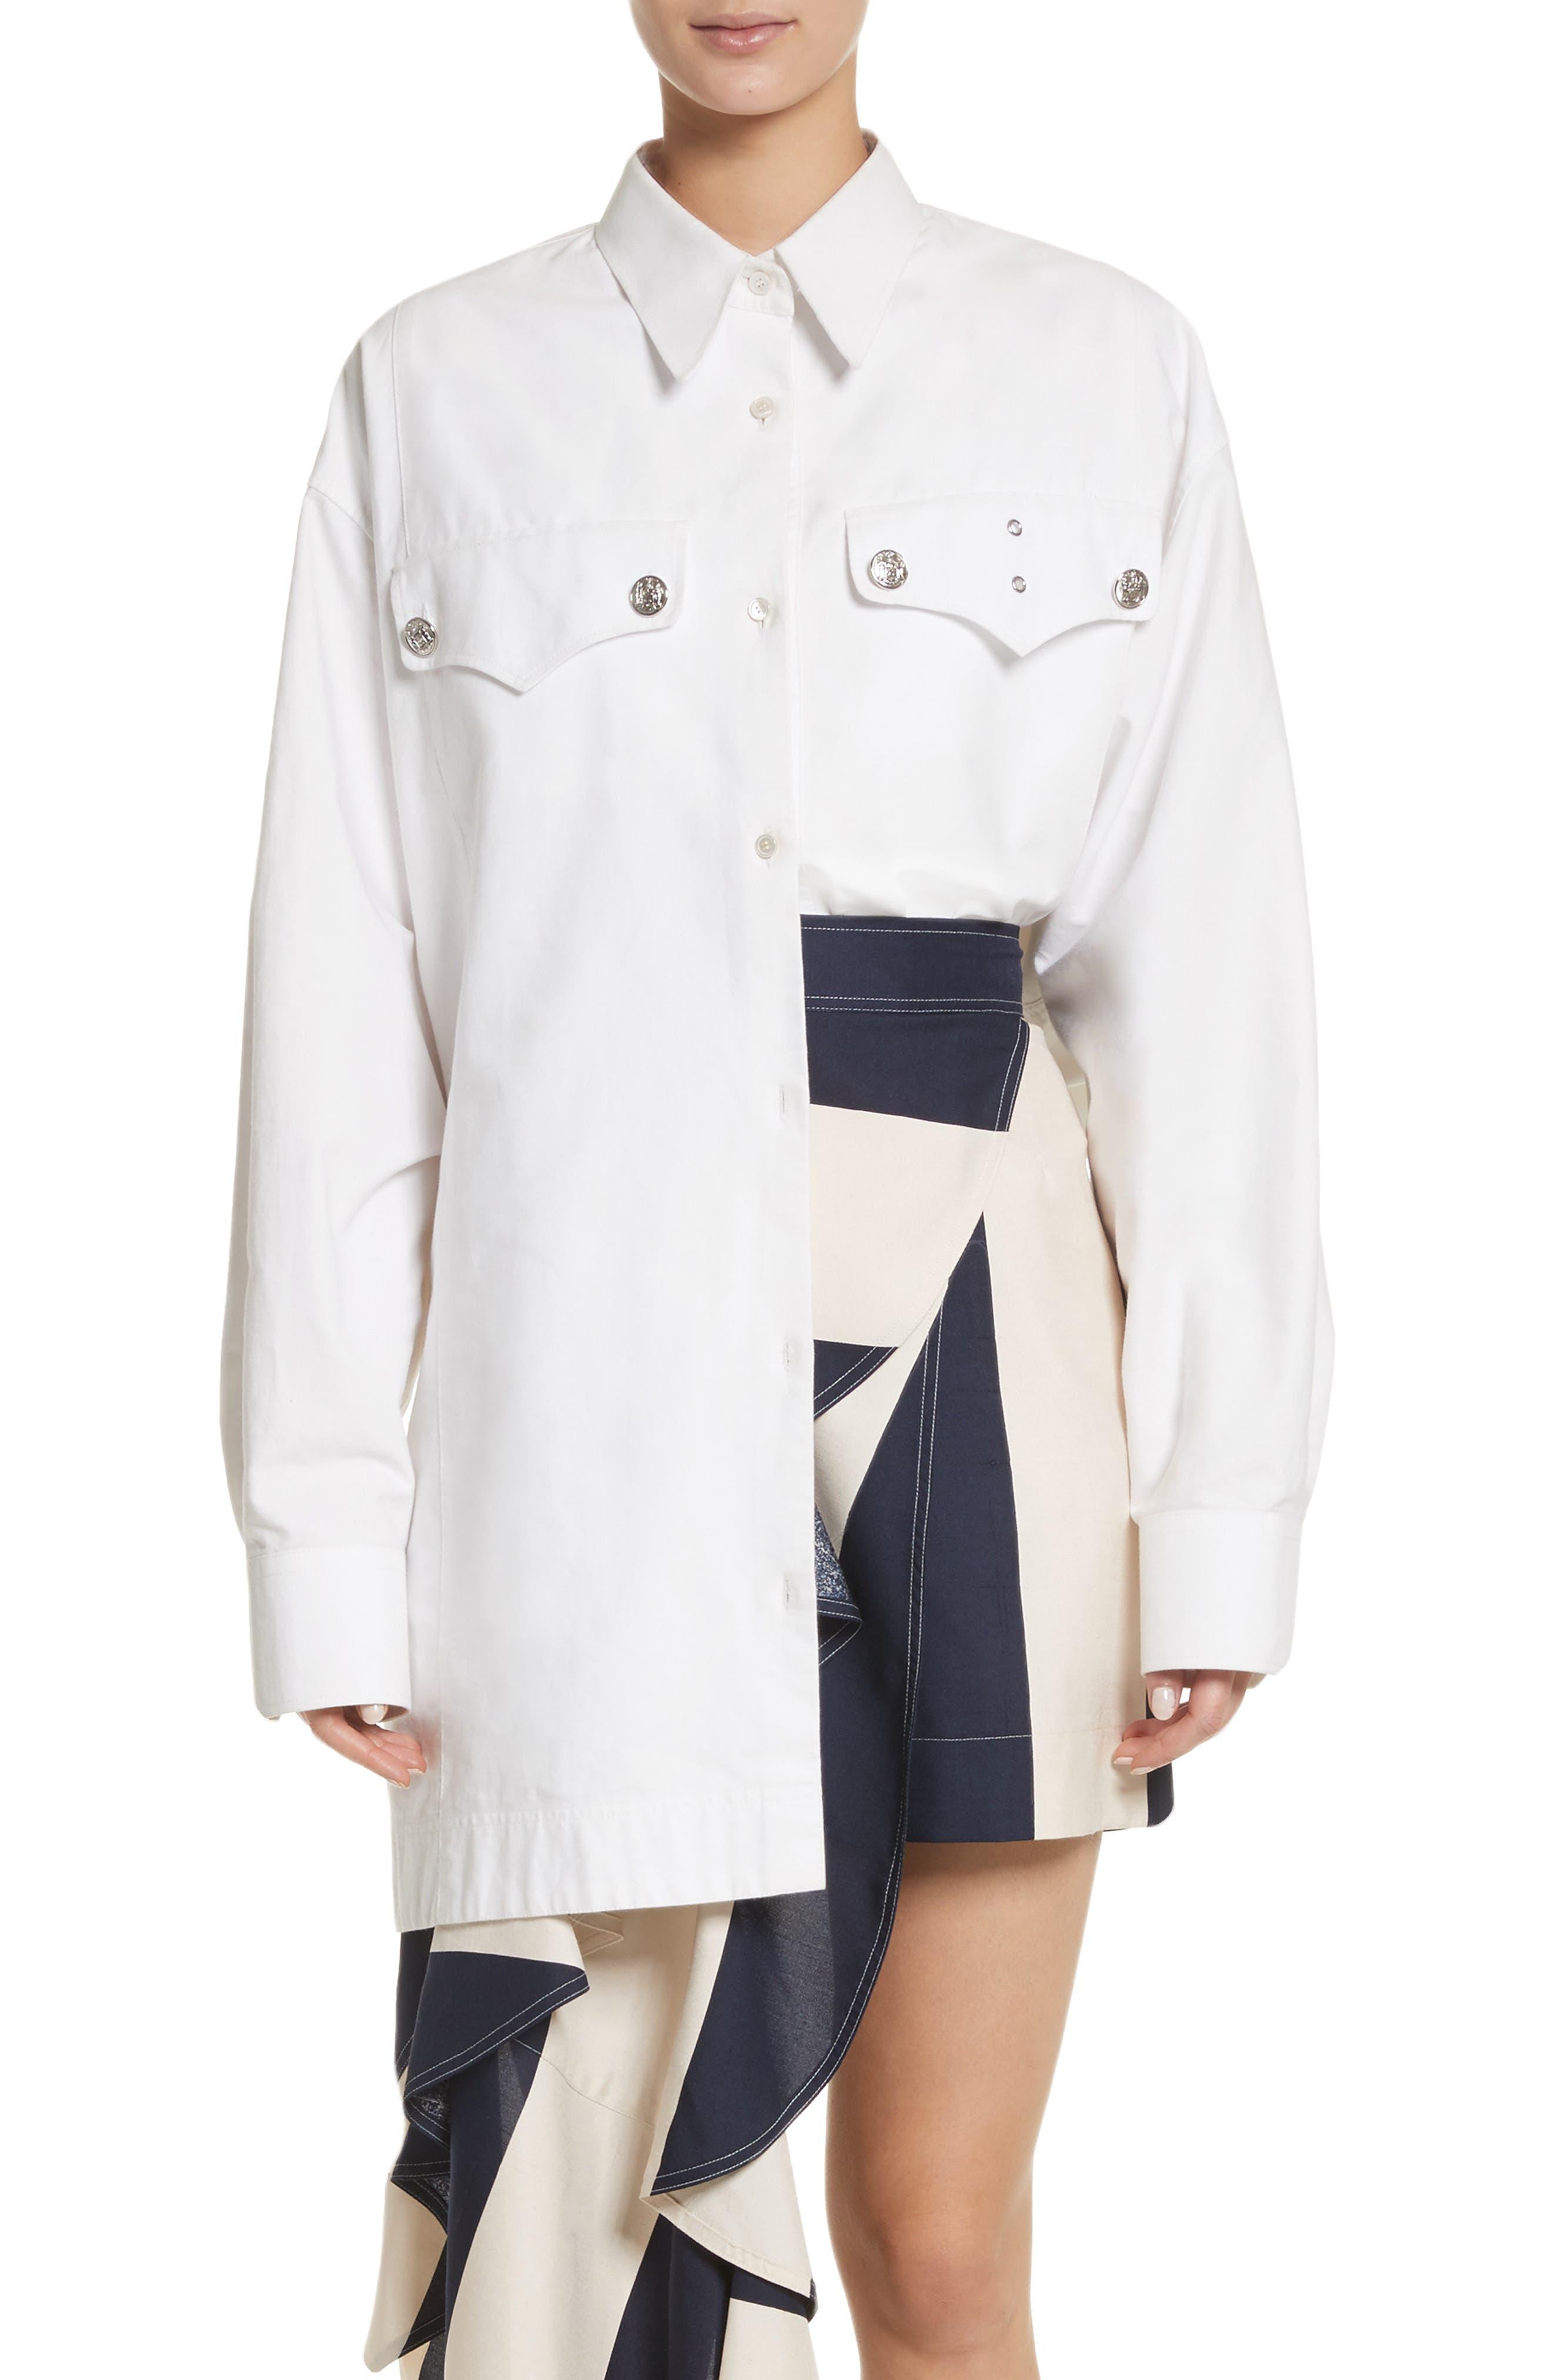 Main Image - Calvin Klein 205W39NYC Oversize Policeman Shirt